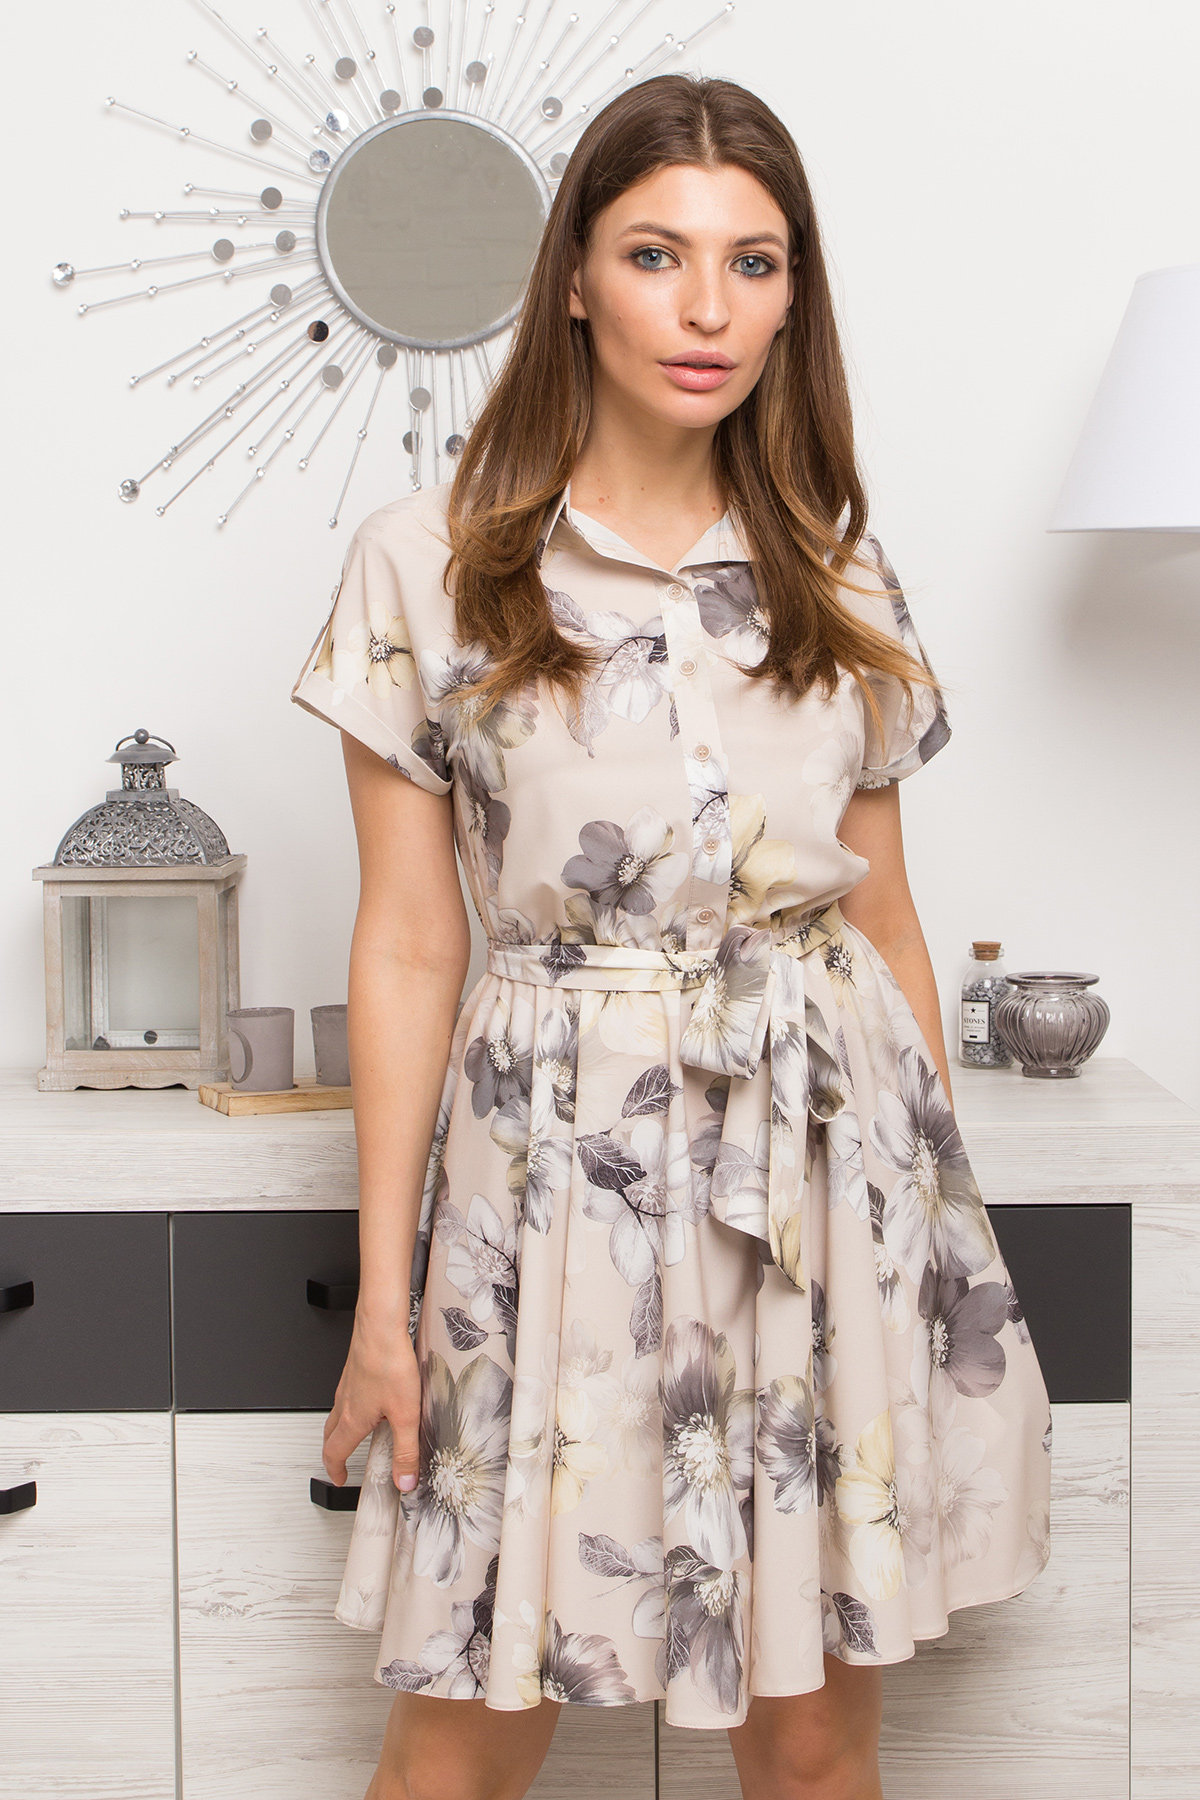 Платье Санжар 9095 АРТ. 45416 Цвет: Цветы кр беж/мол/охра - фото 3, интернет магазин tm-modus.ru